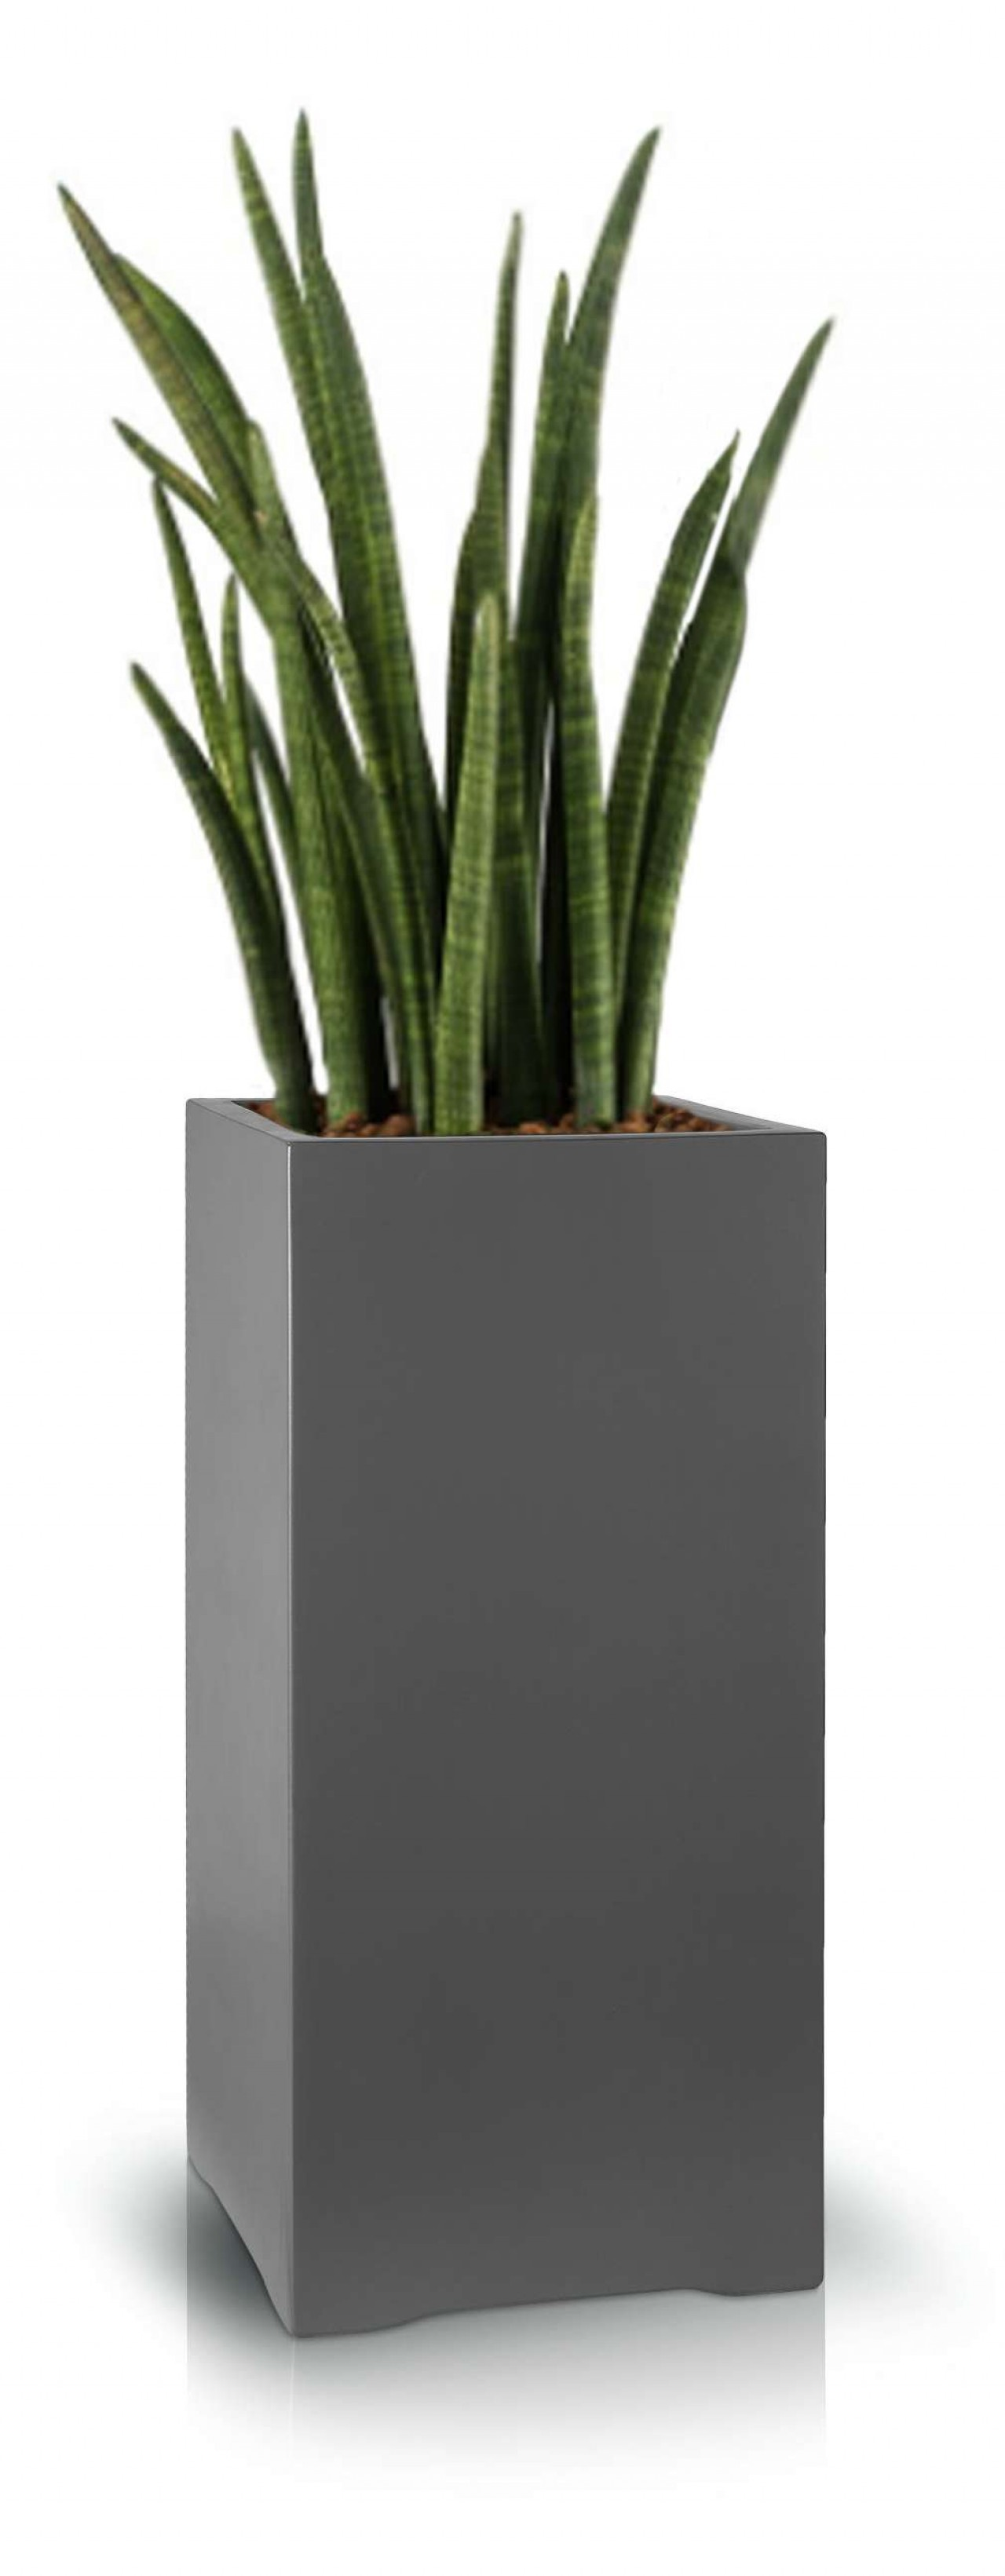 Donica Fiberglass 600 x 280 mm 95.018.60